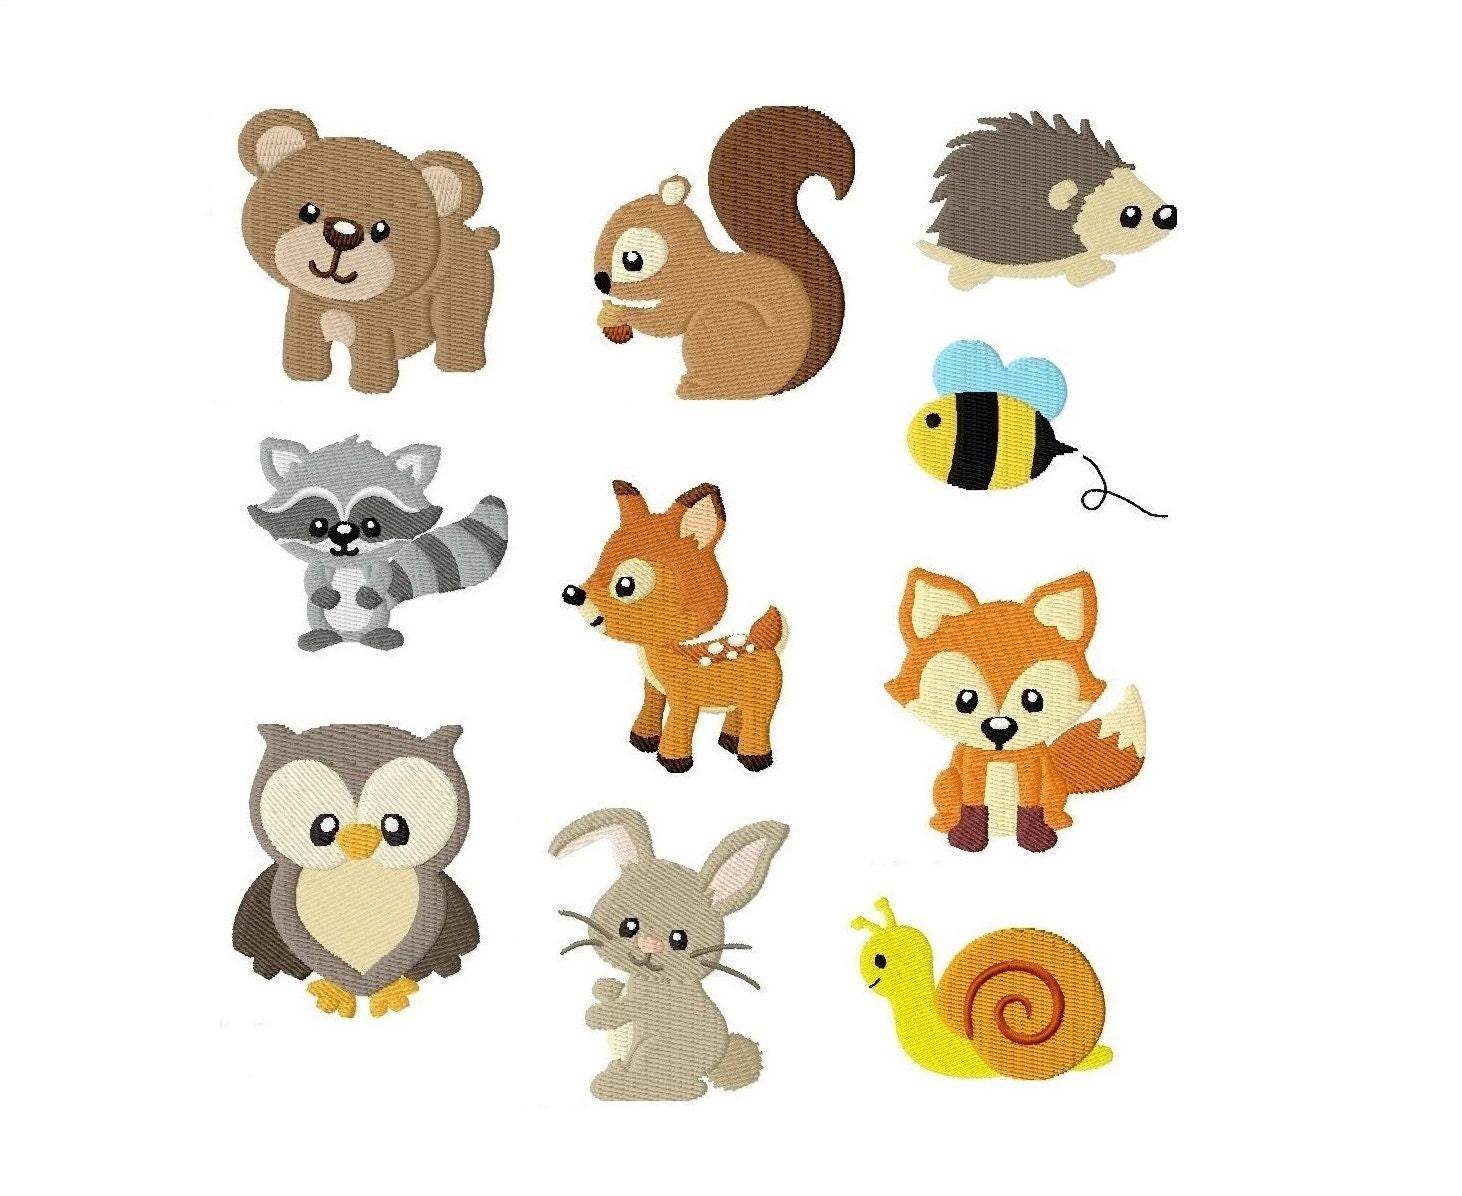 Embroidery design set woodland animals x digital